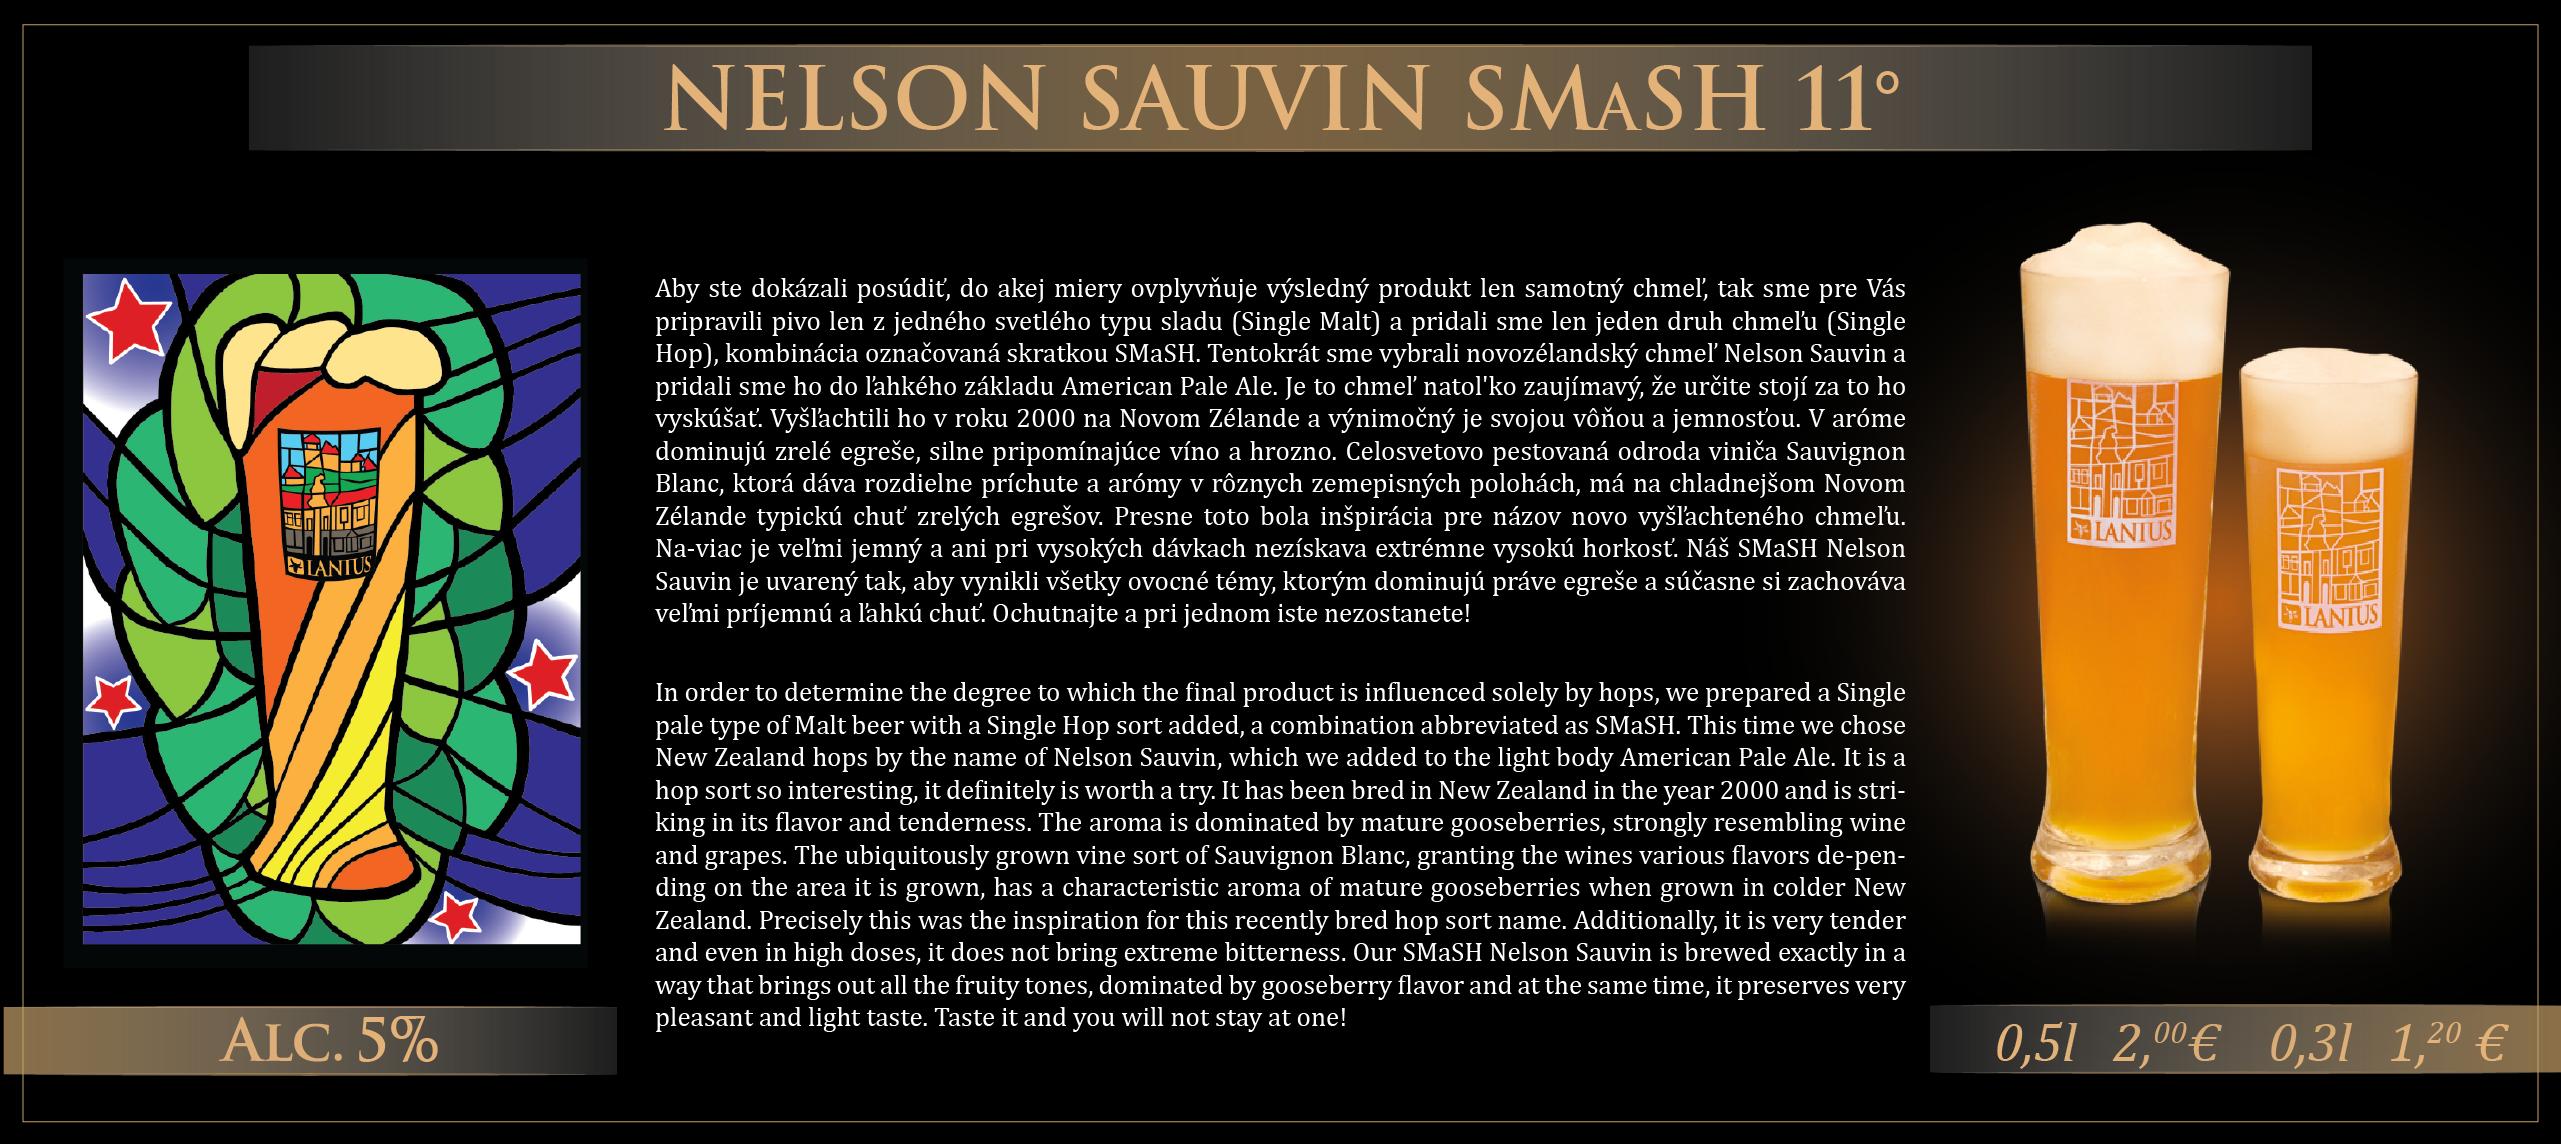 nelson_sauvin_smash_web-03